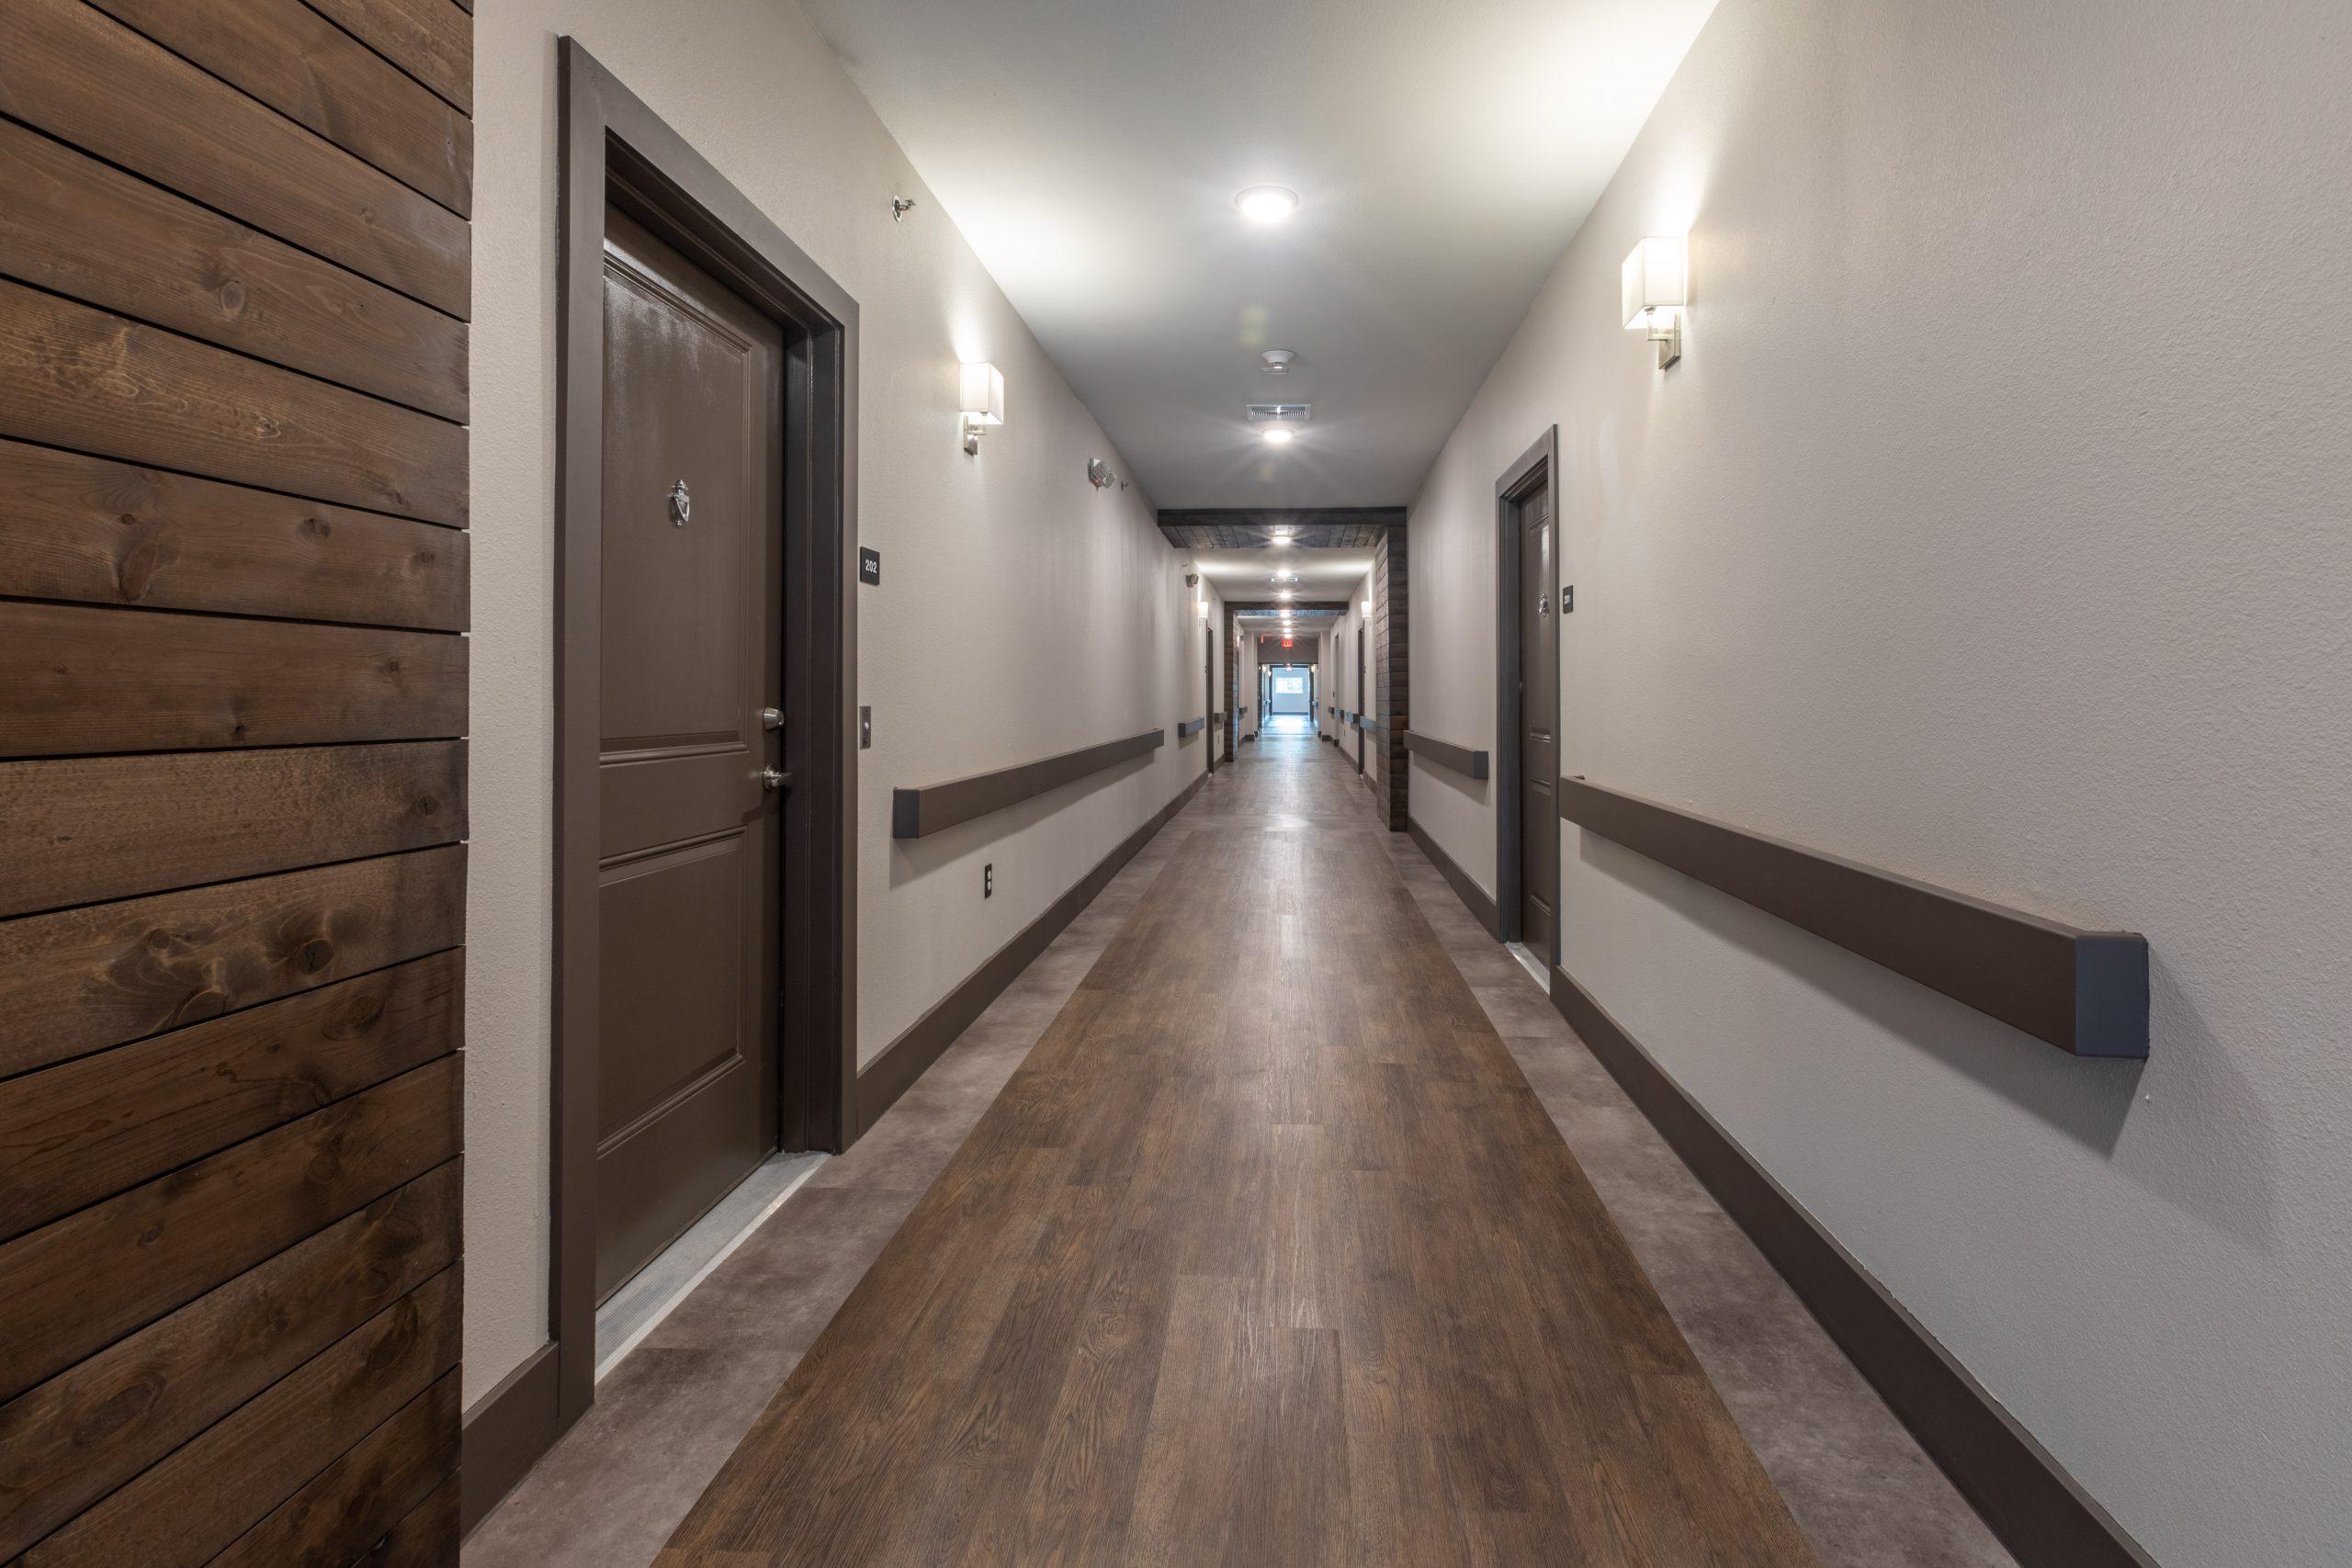 hallway in apartment building